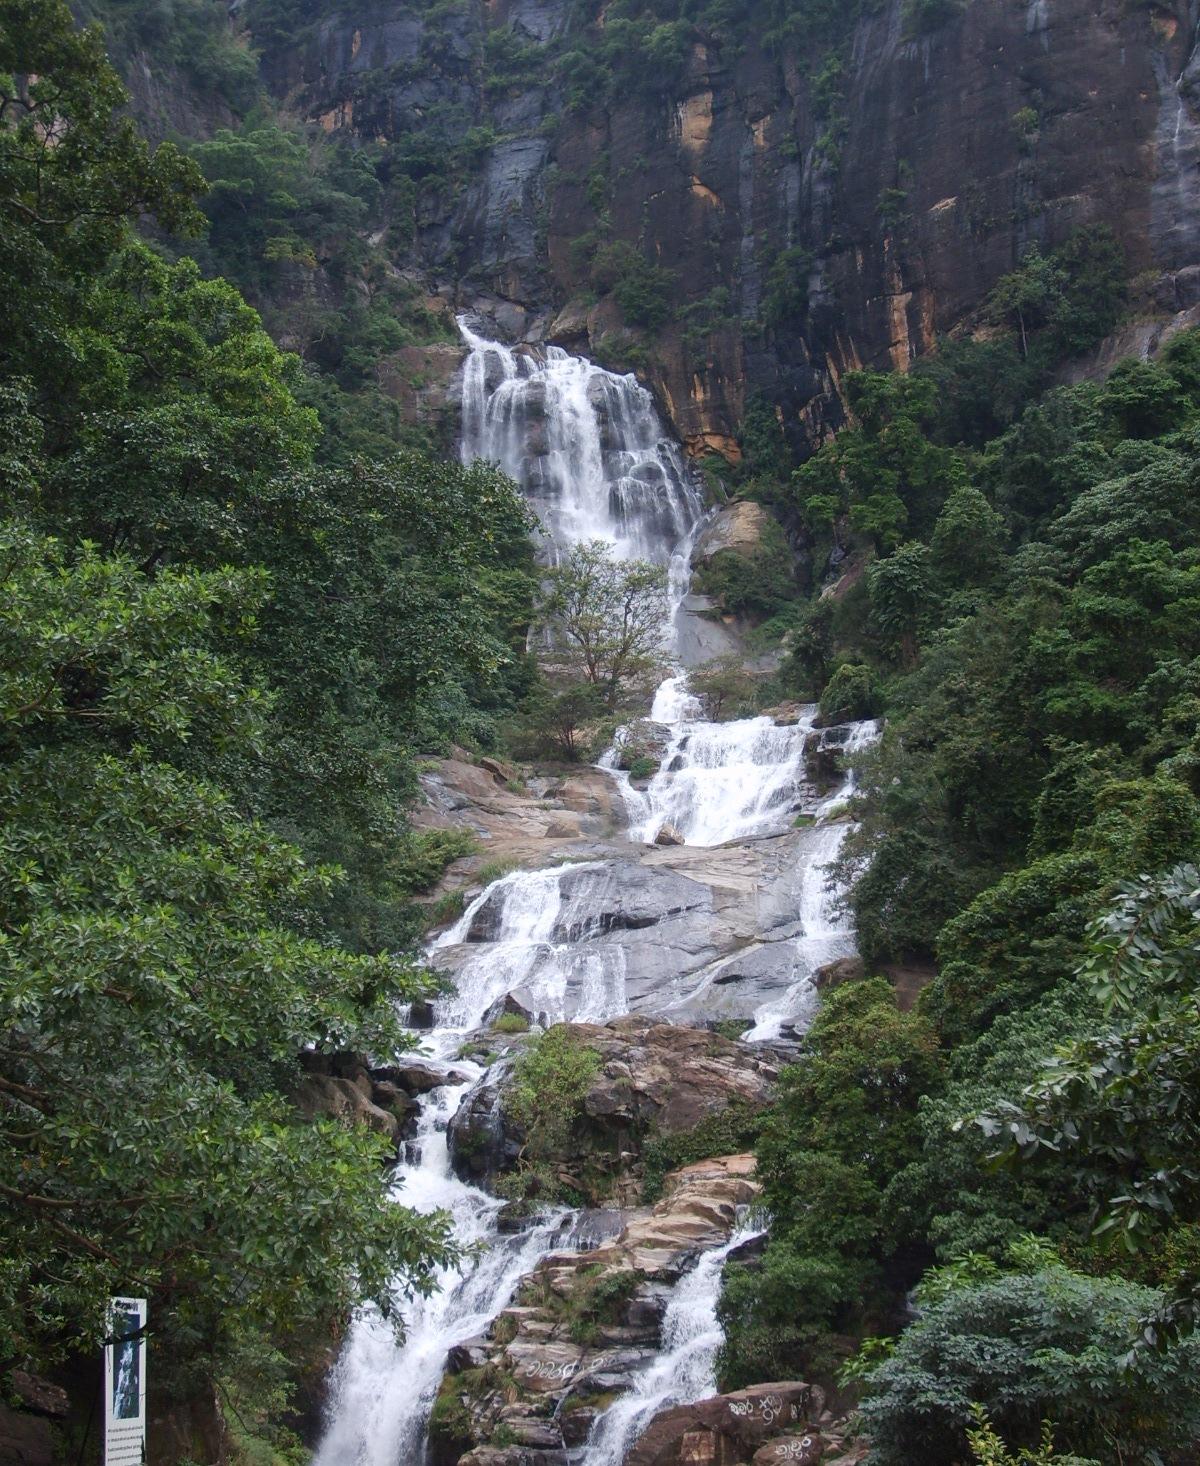 Ravana Falls - Wikiped...